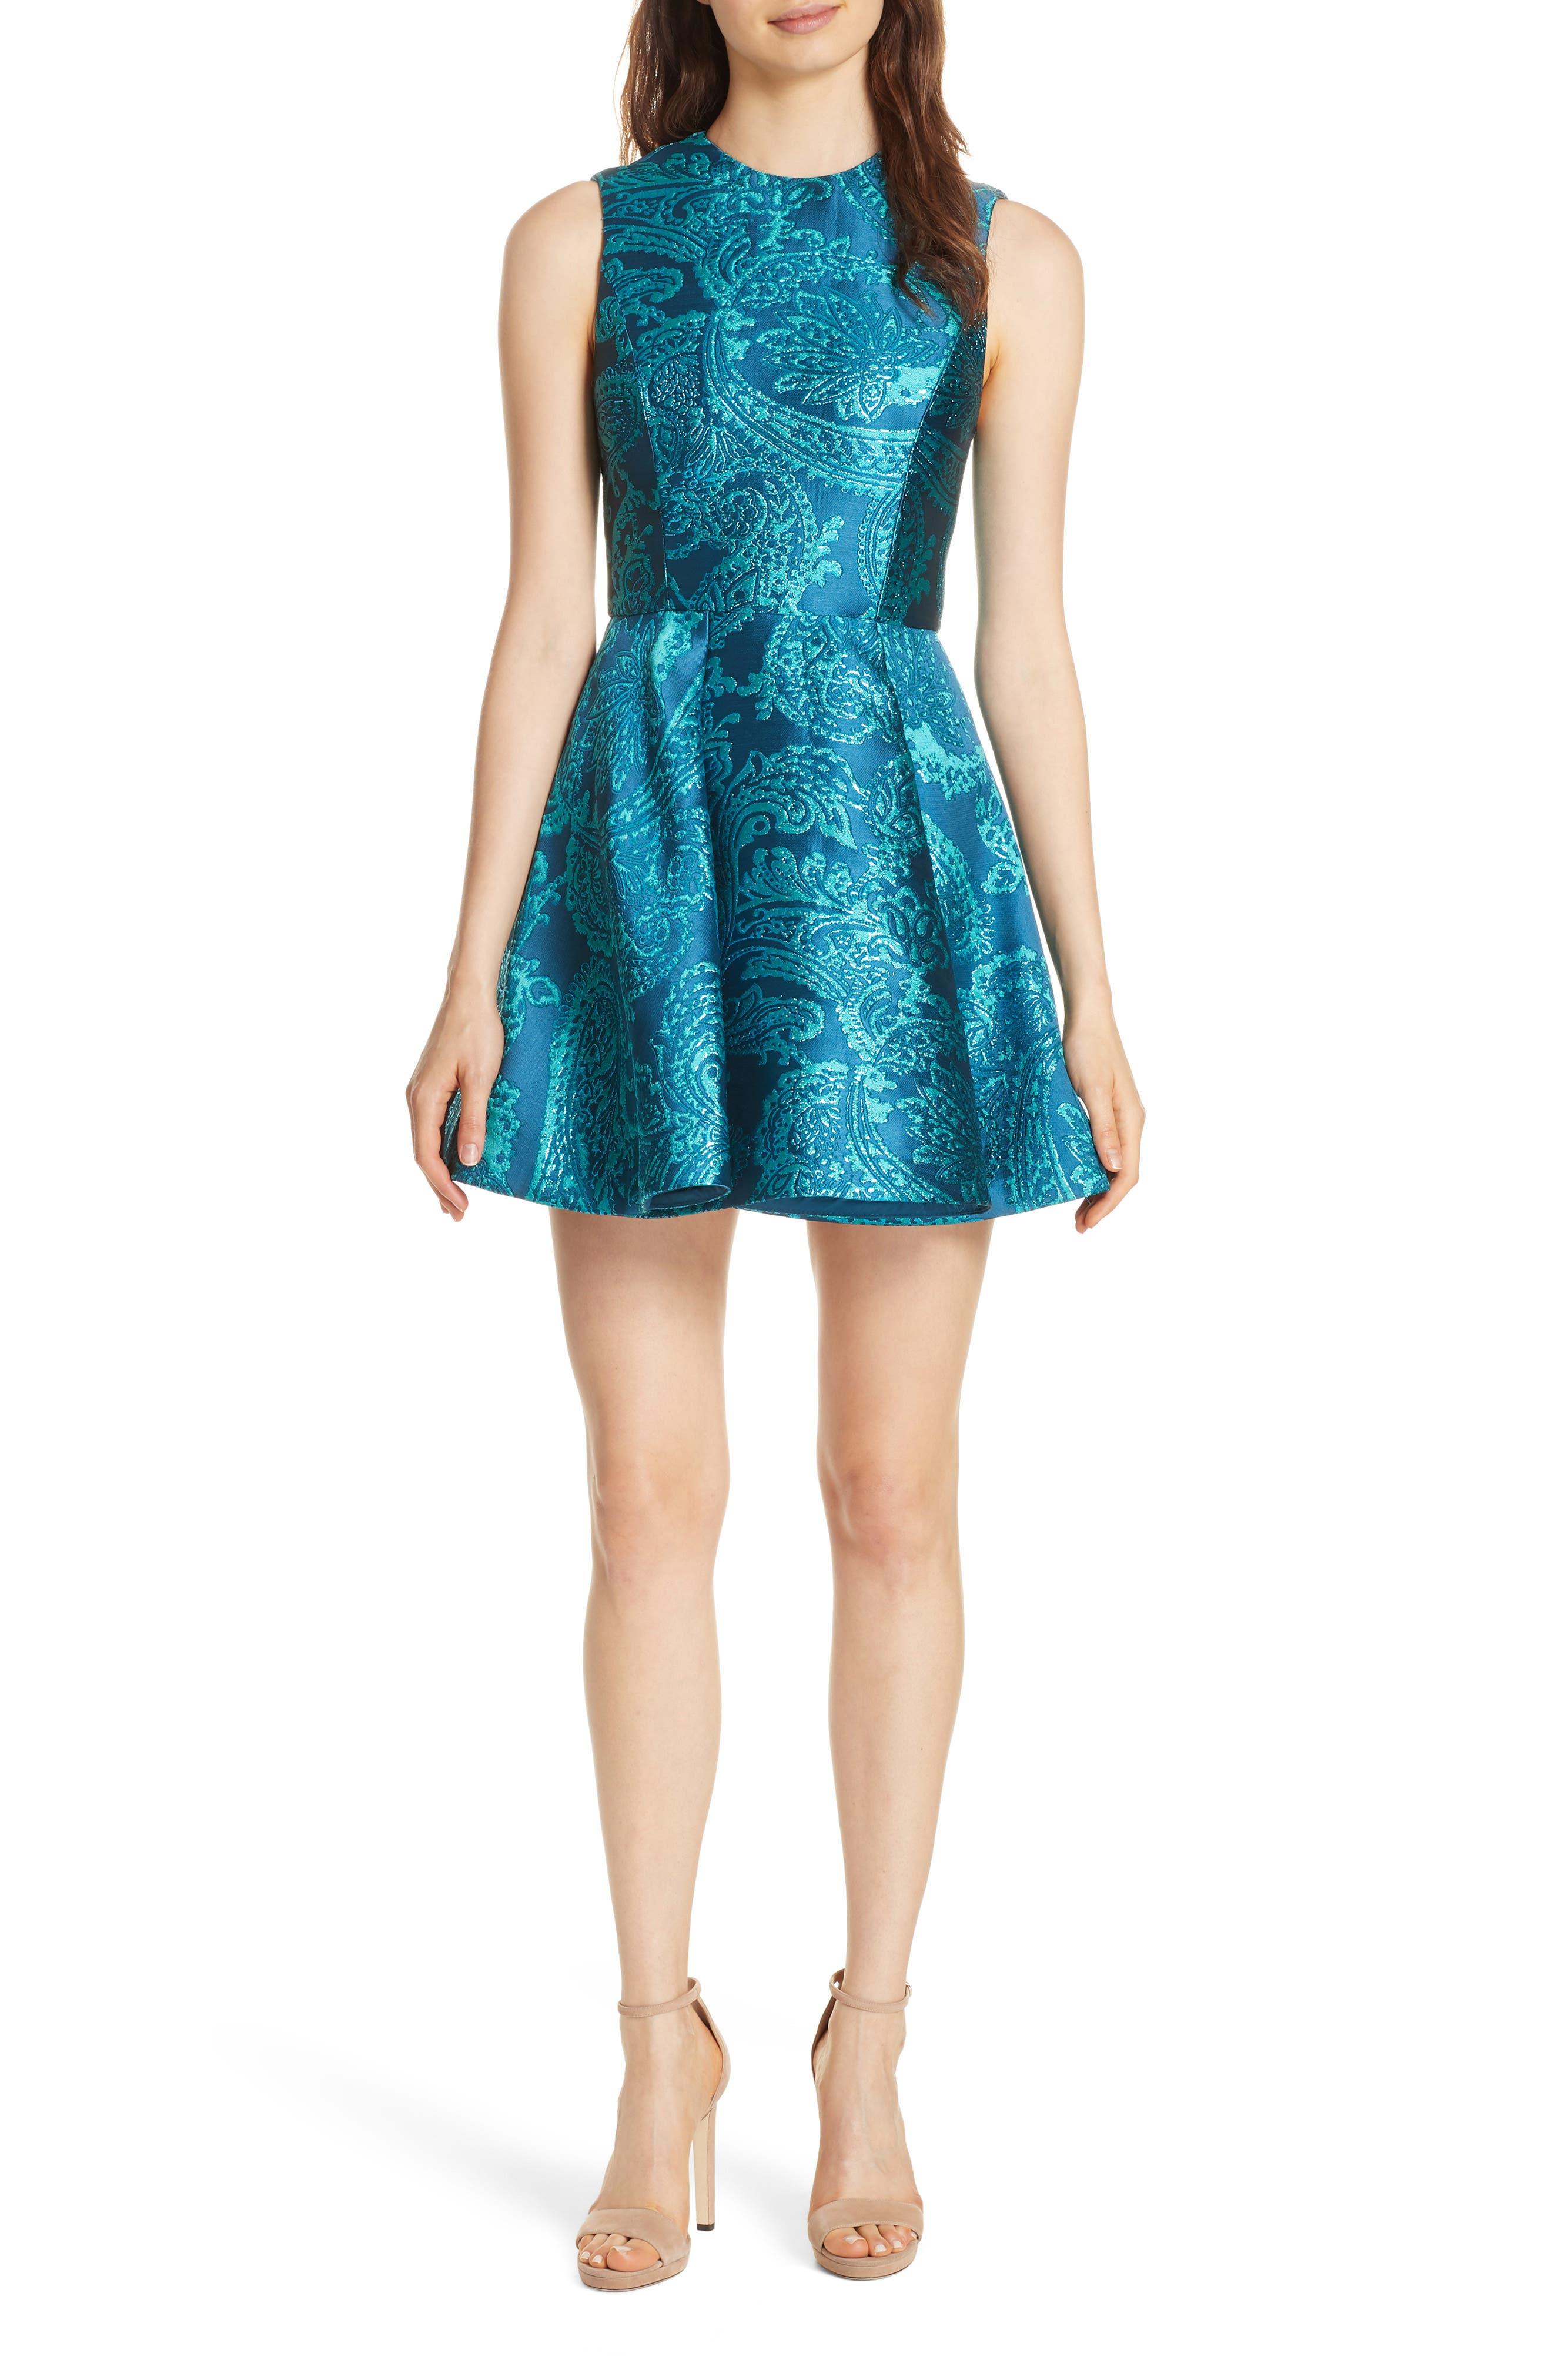 Alice + Olivia Stasia Paisley Fit & Flare Dress, Blue/green